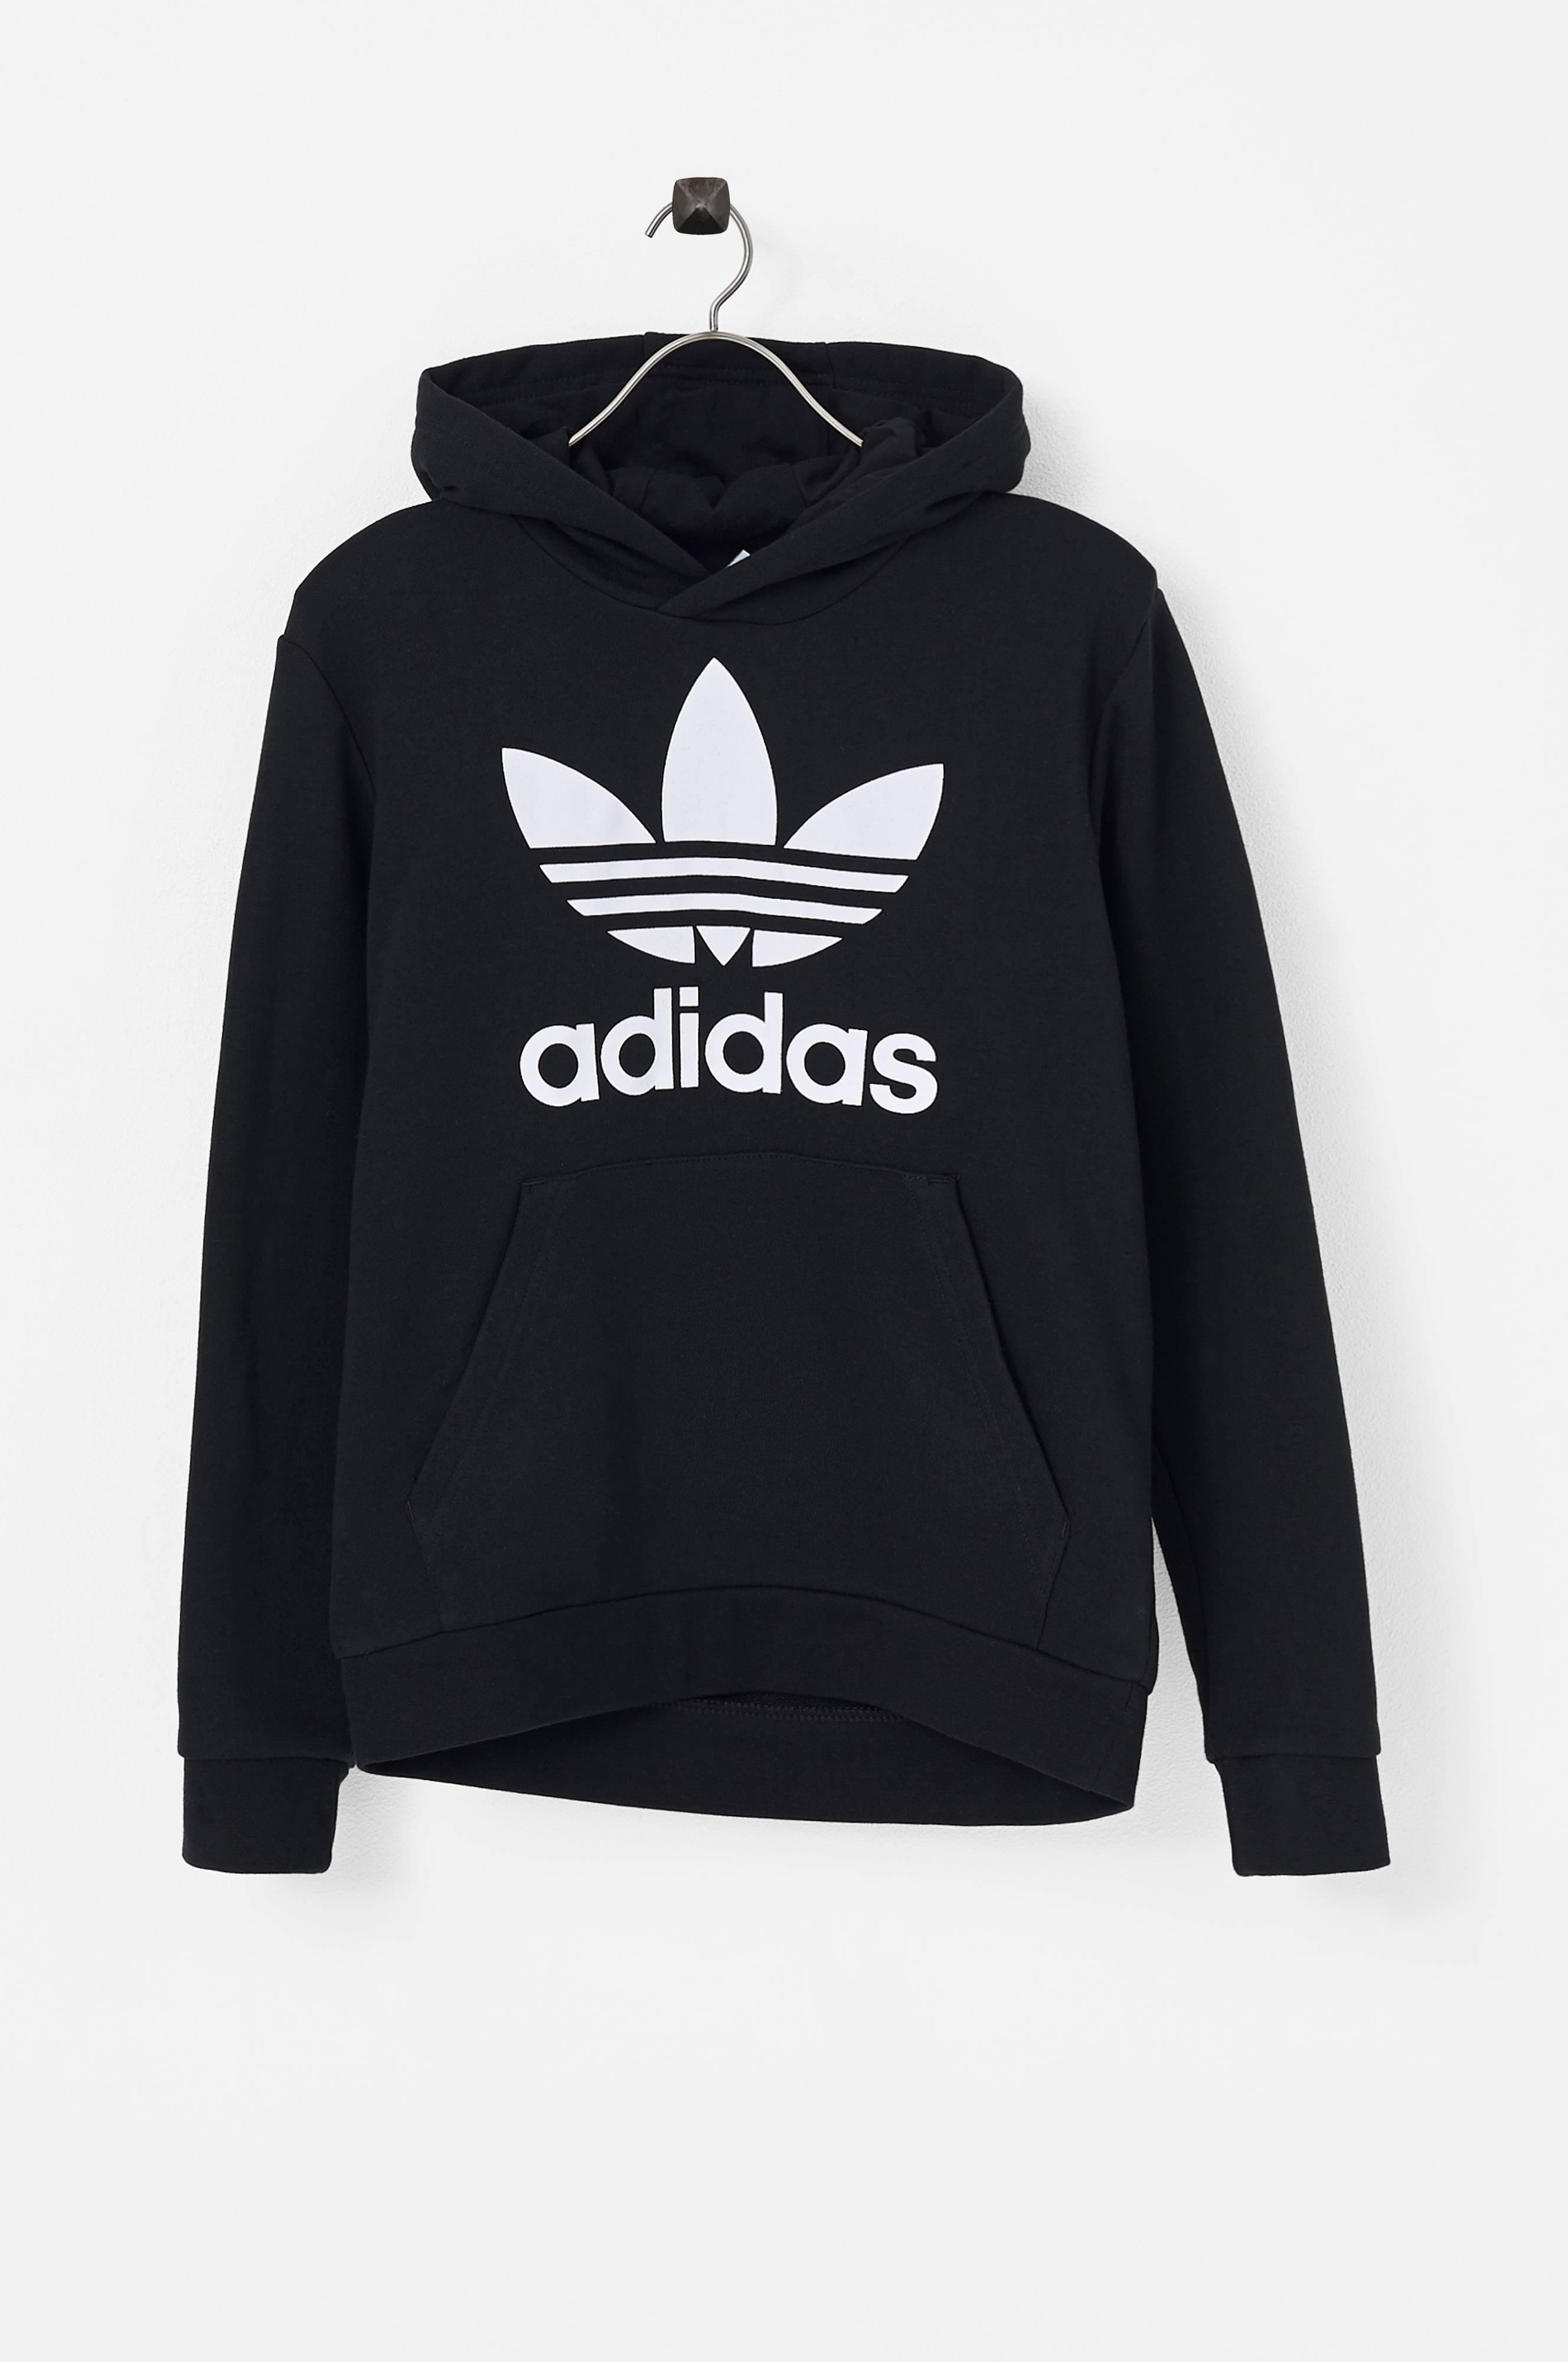 Trefoil Hoodie by Adidas Originals